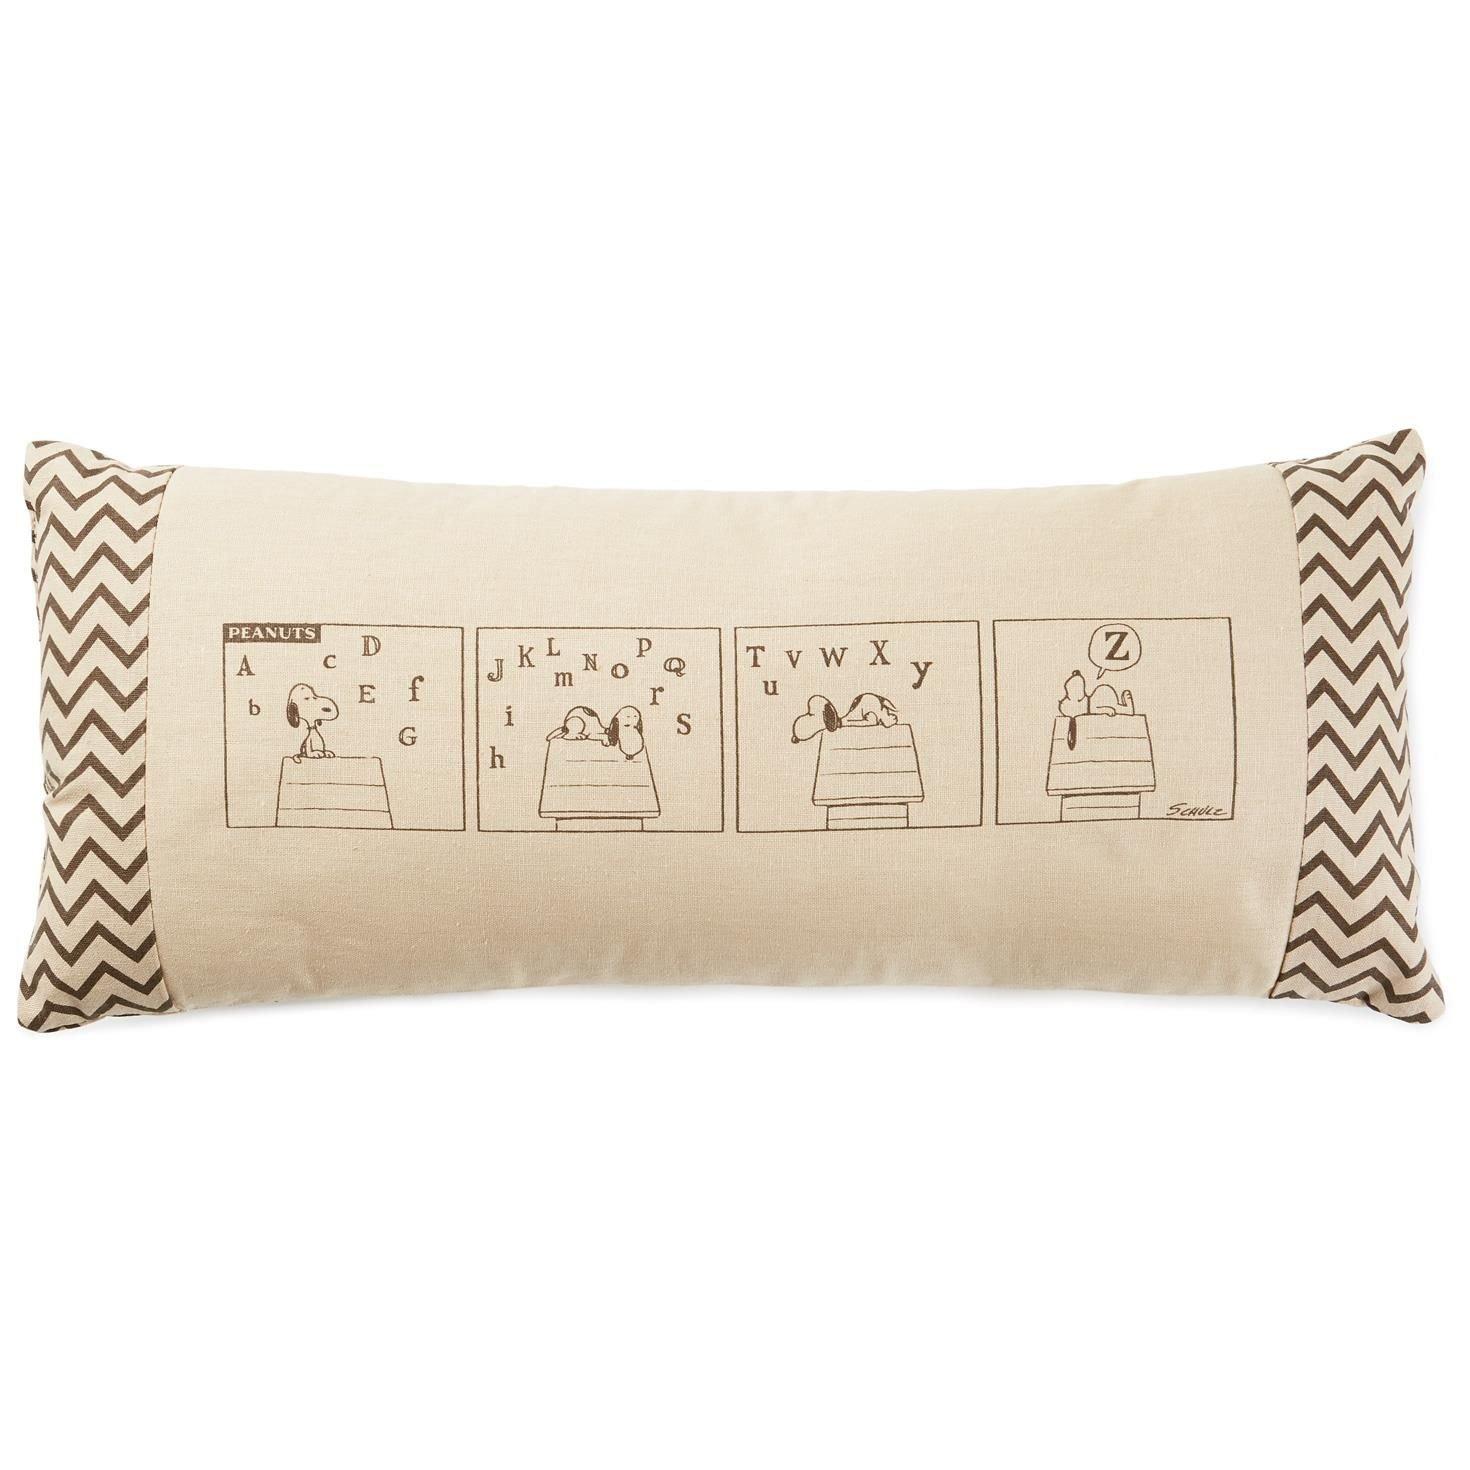 Hallmark Peanuts Snoopy Sleeping Rectangle Pillow, 18x8 Pillows & Blankets Movies & TV